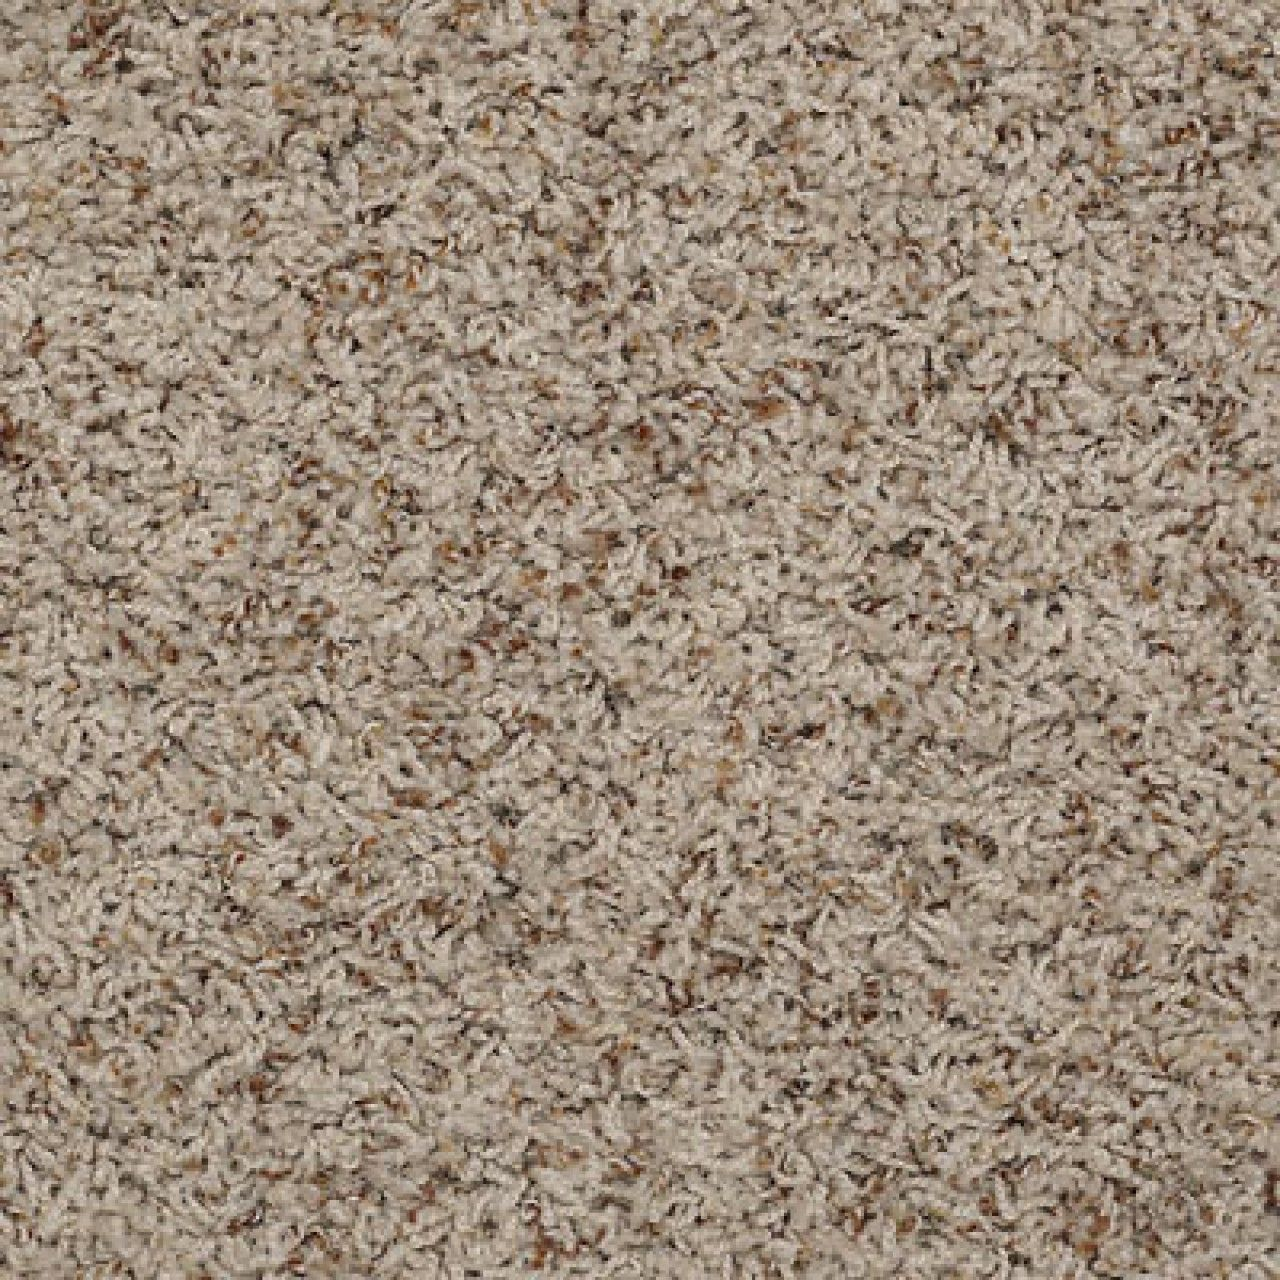 Shaw Alamar B Q4532 Shell Anso Nylon Carpet In 2019